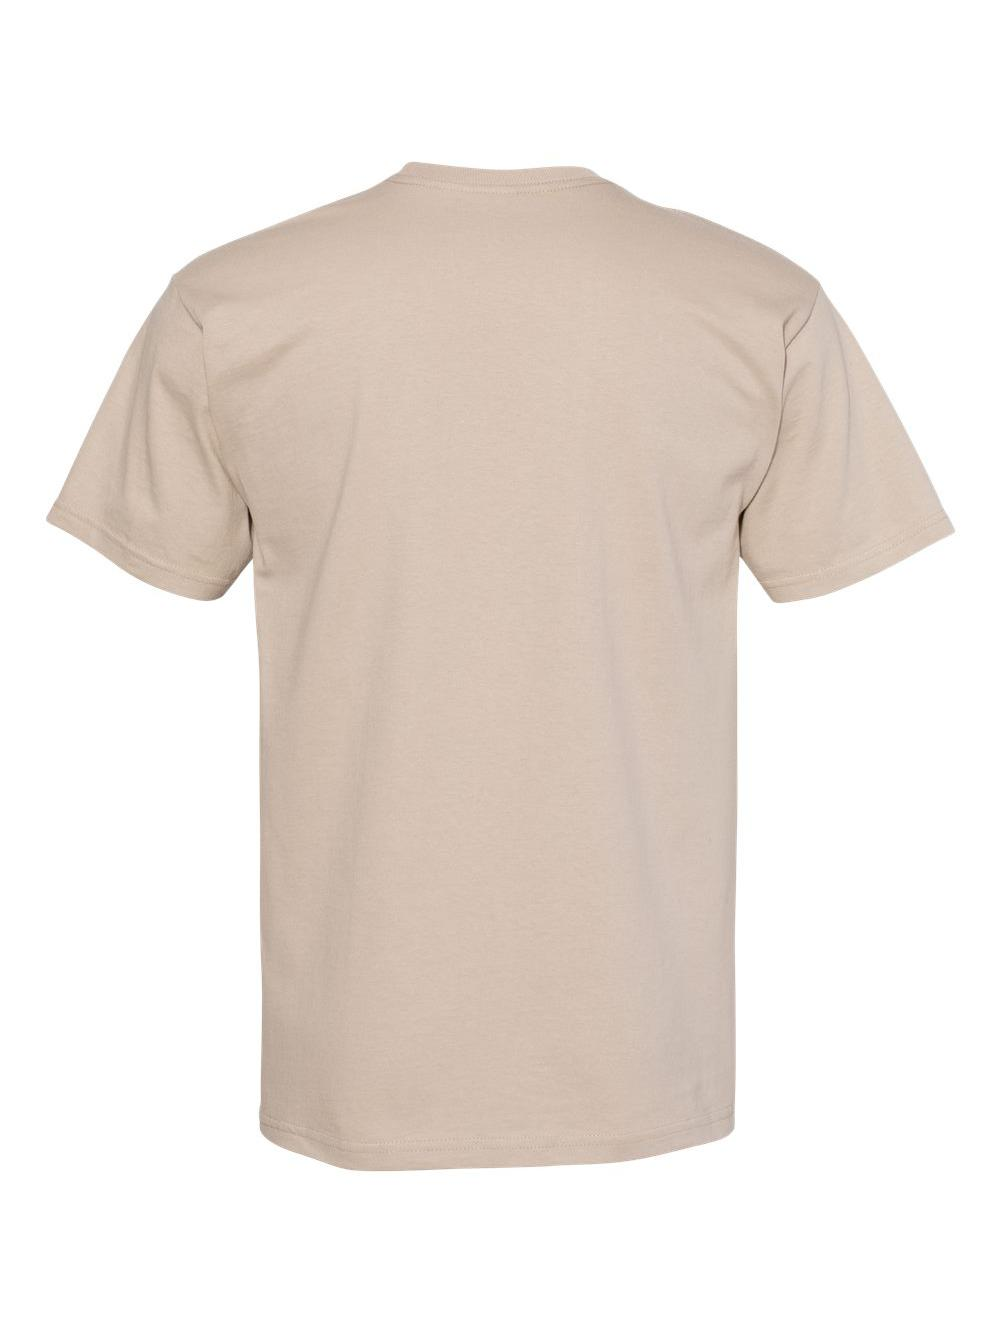 ALSTYLE-Premium-T-Shirt-1701 thumbnail 56